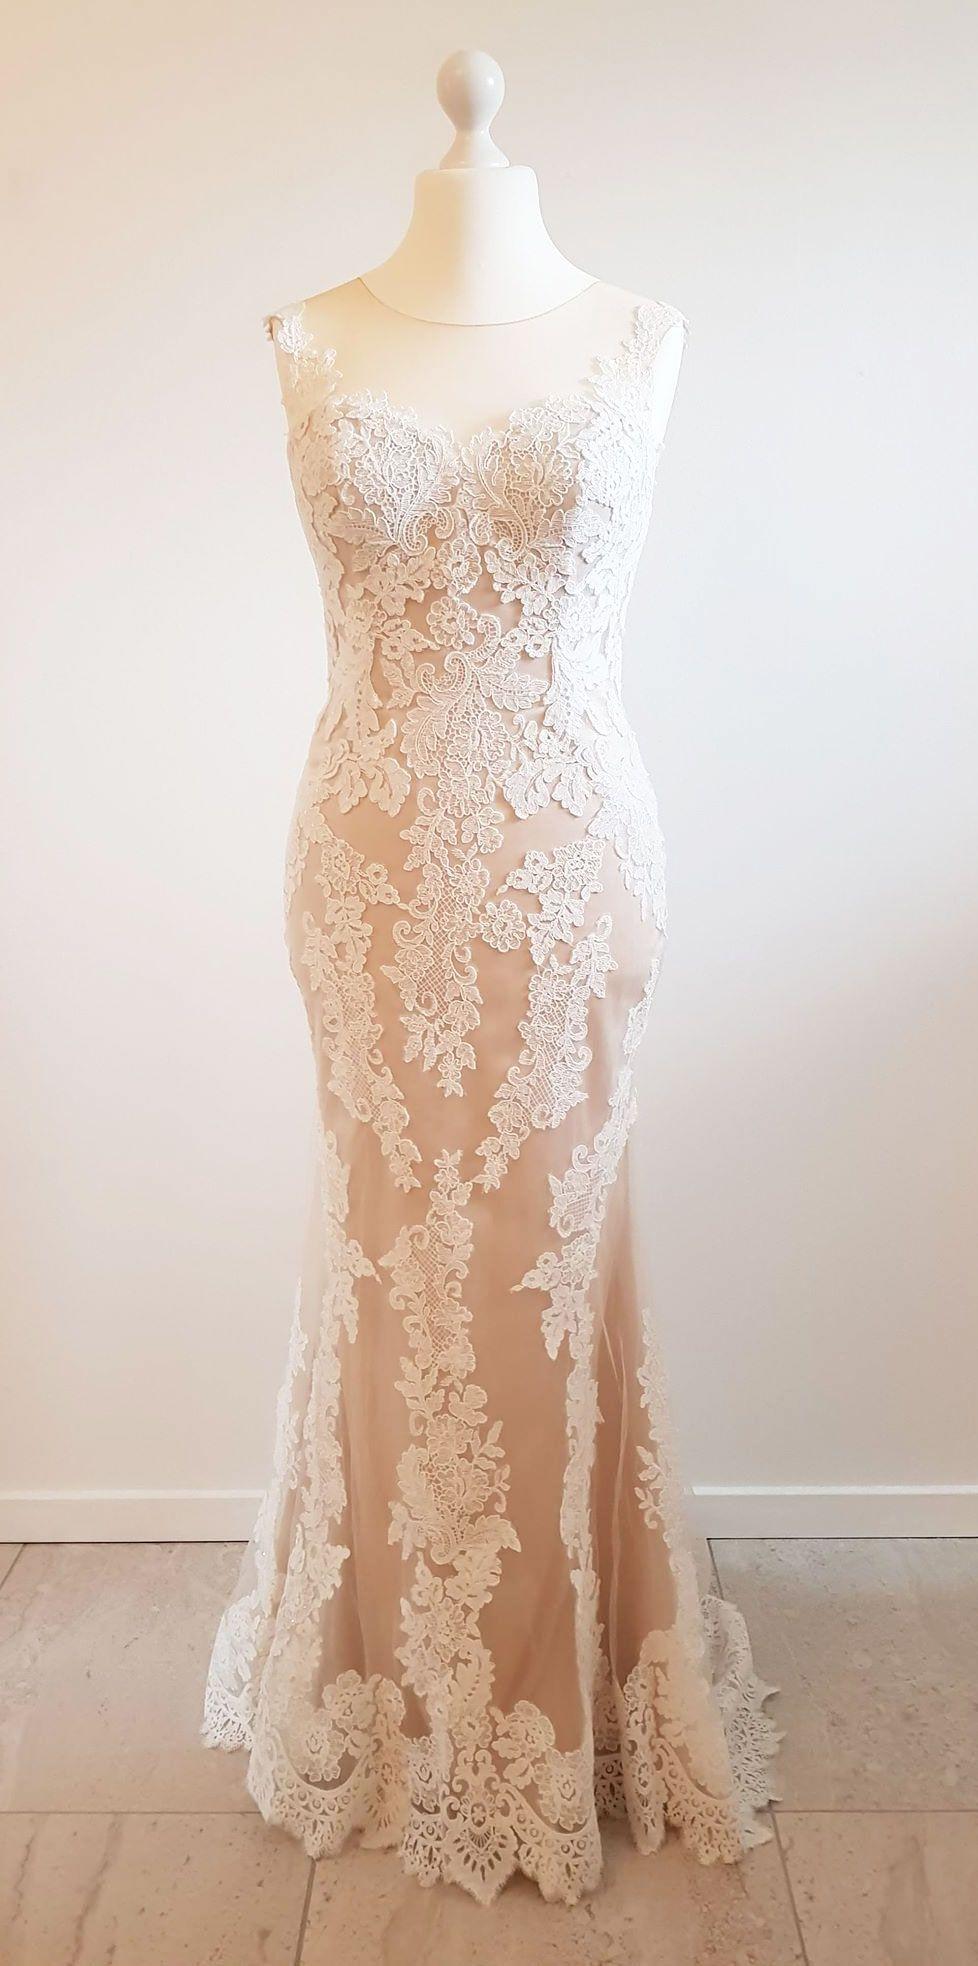 52716254e1ad Blonde brudekjole fra Beautiful Bridal med moccafarvet underkjole i satin.  Kjolen har lille slæb.